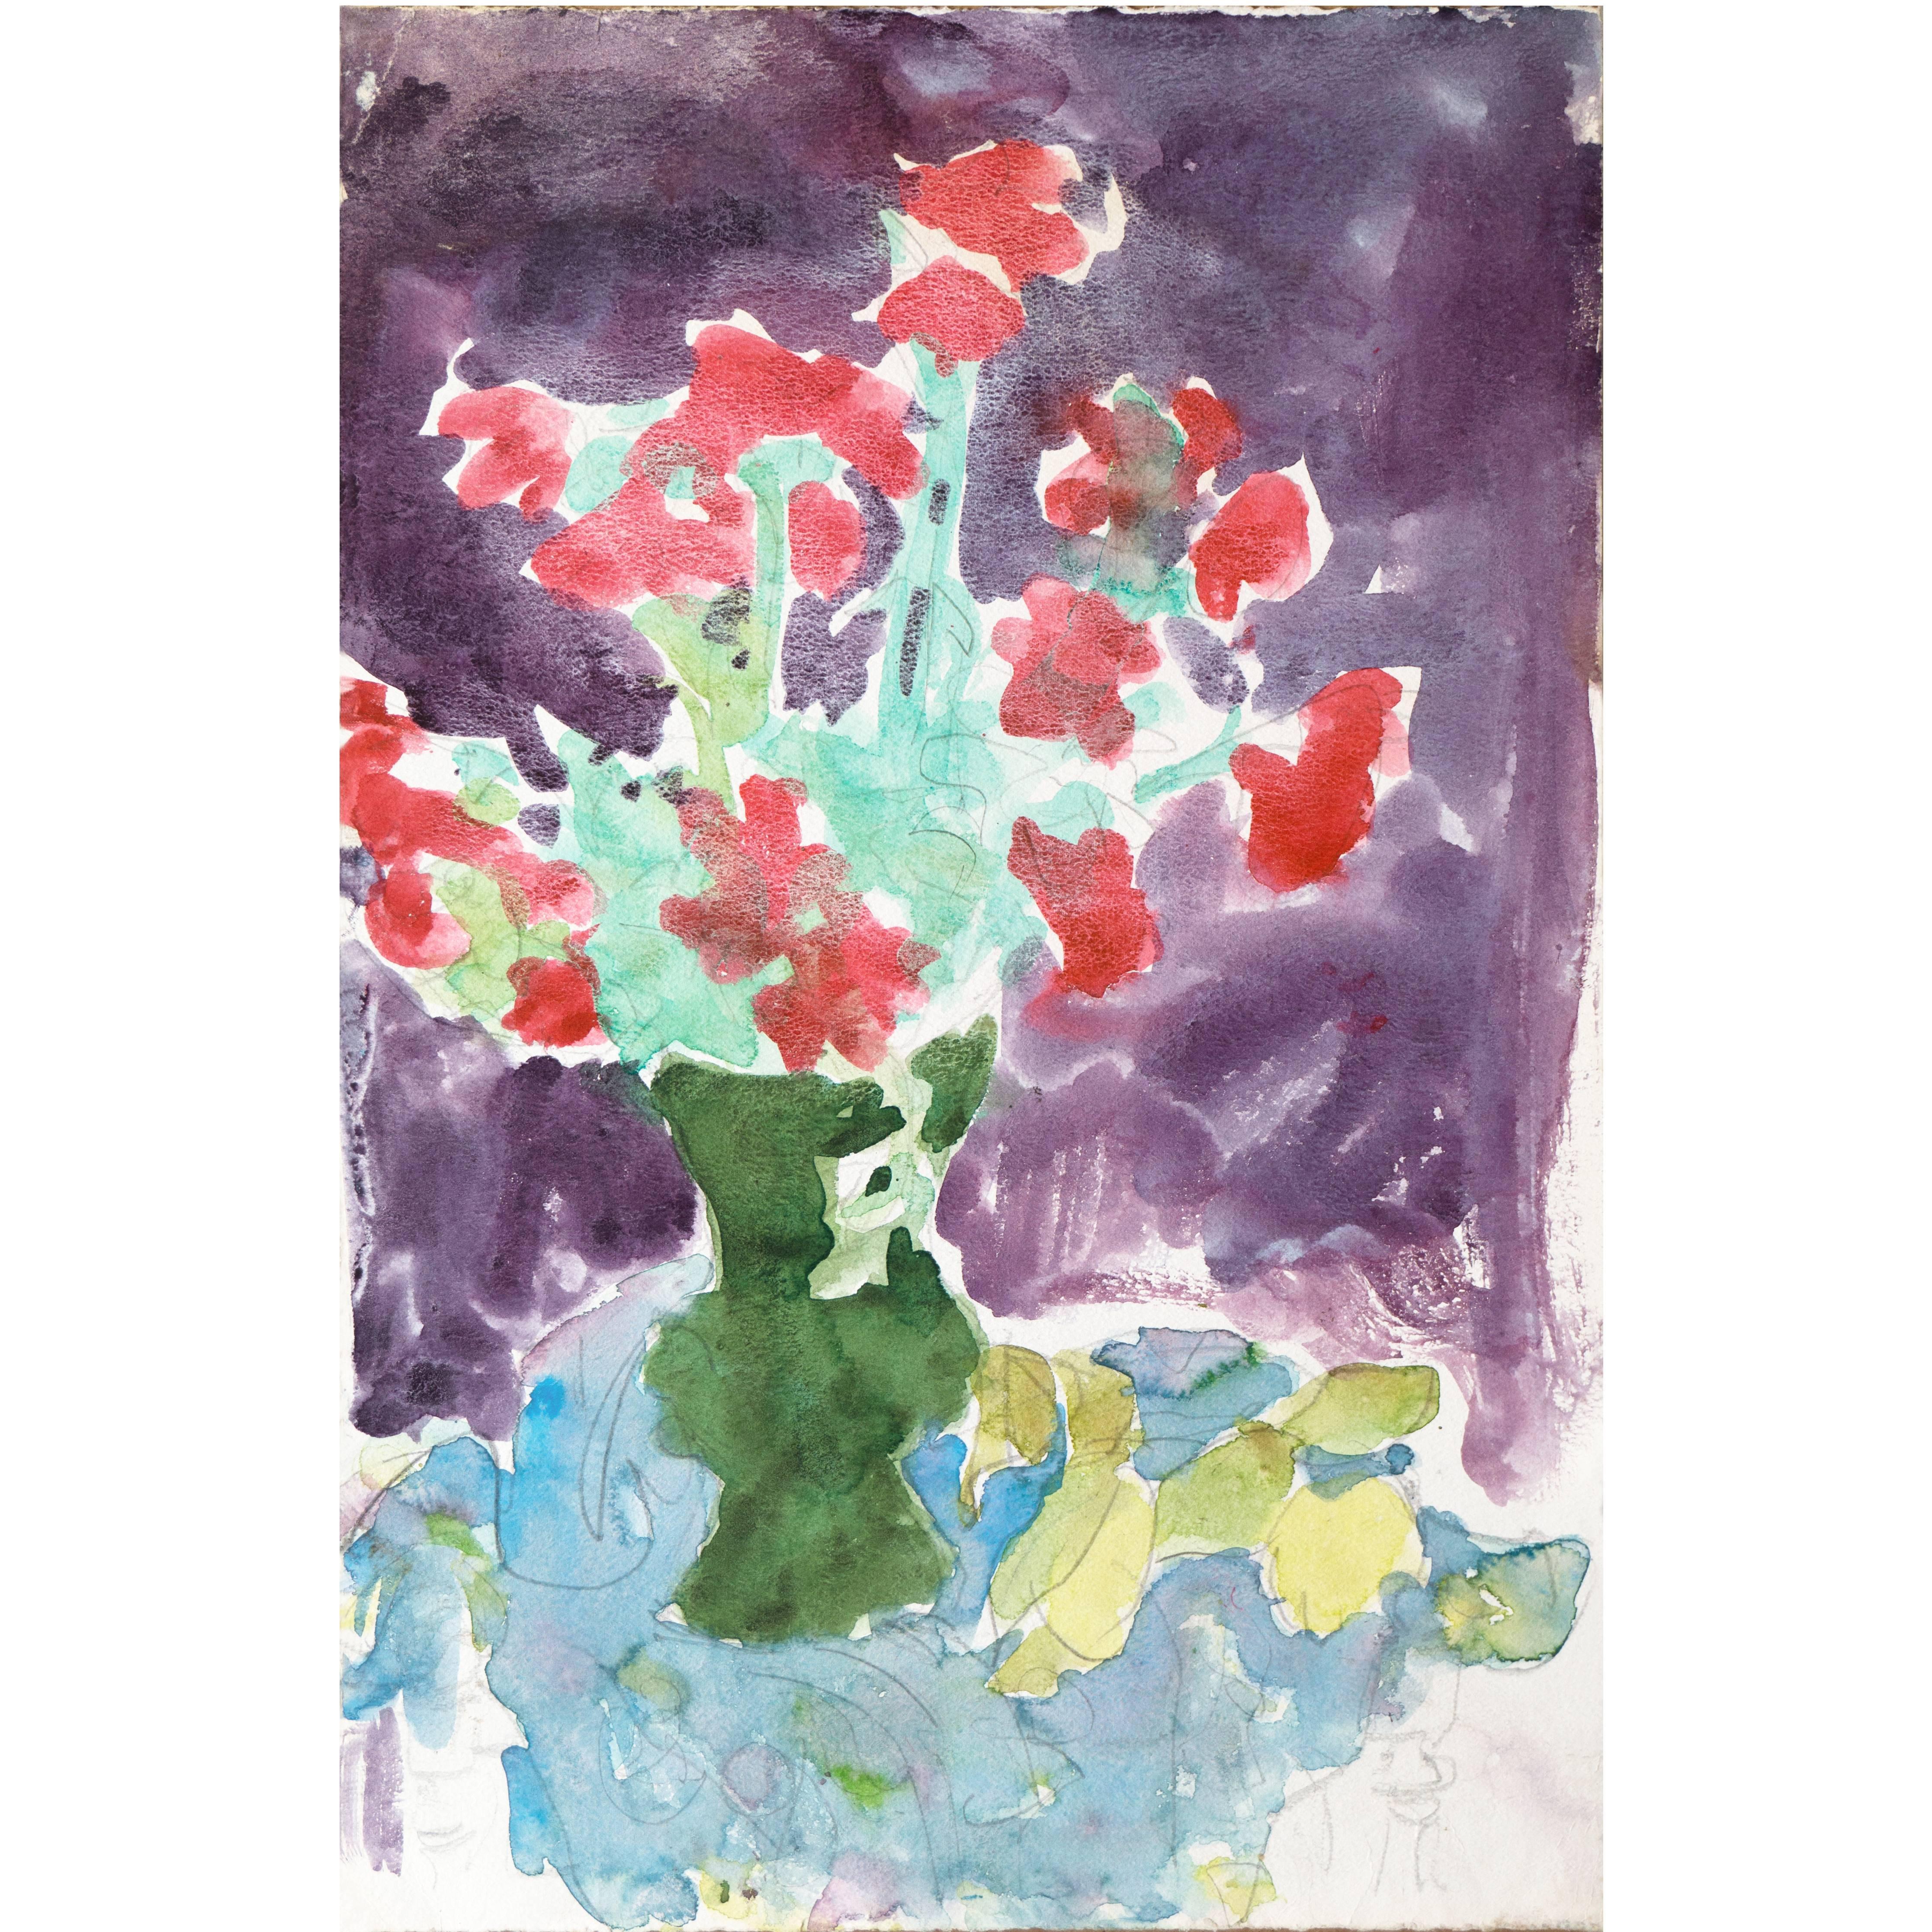 California Post-Impressionist 'Poppies', Louvre, LACMA, SFAA, Académie Chaumière